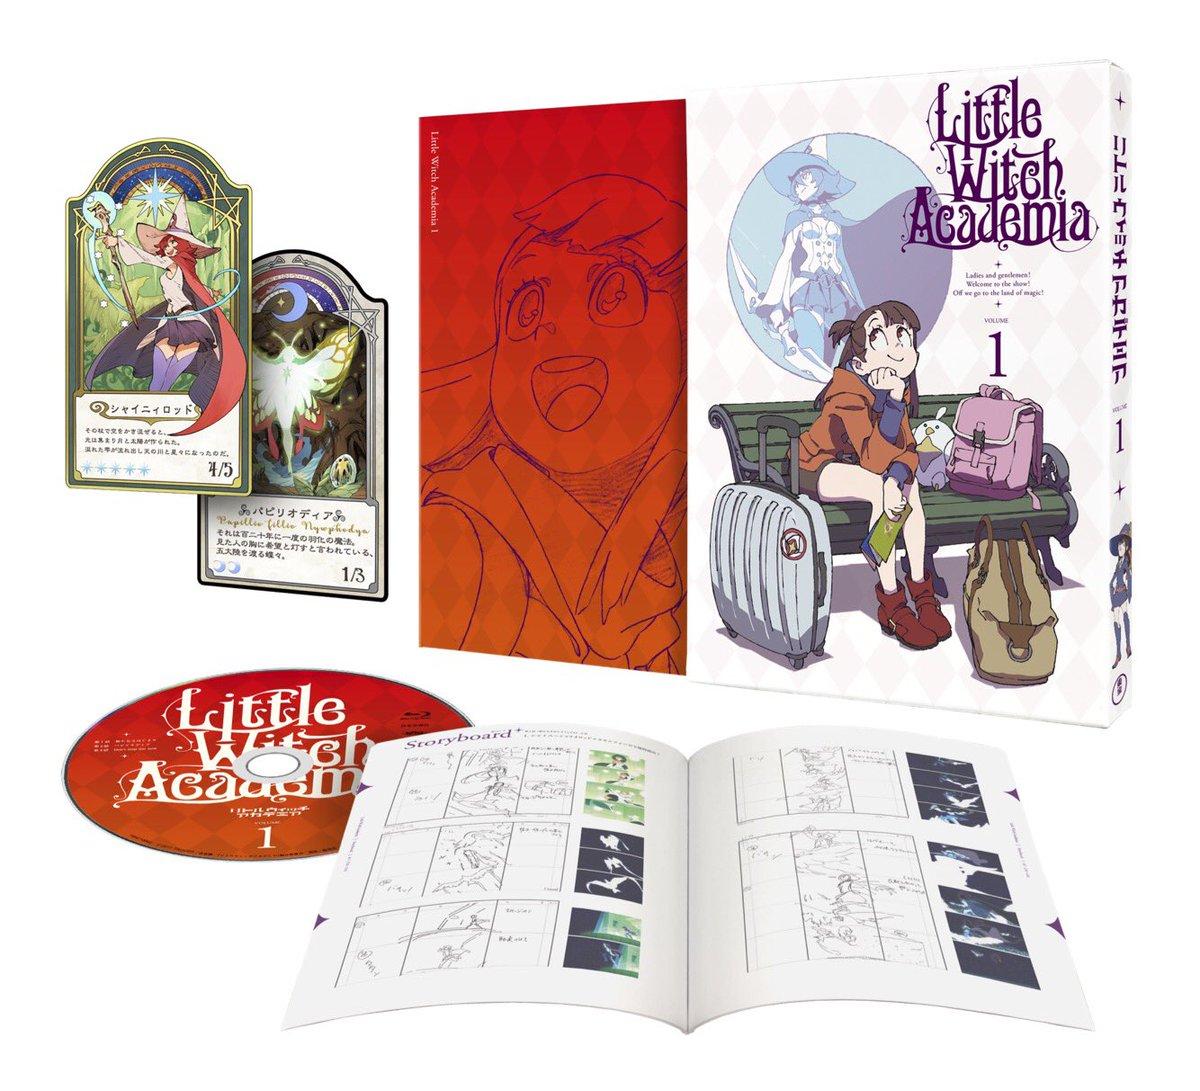 TVアニメ「リトルウィッチアカデミア」BD&DVD Vol.1が発売中!そして発売記念、吉成監督をはじめとしたTRIGG